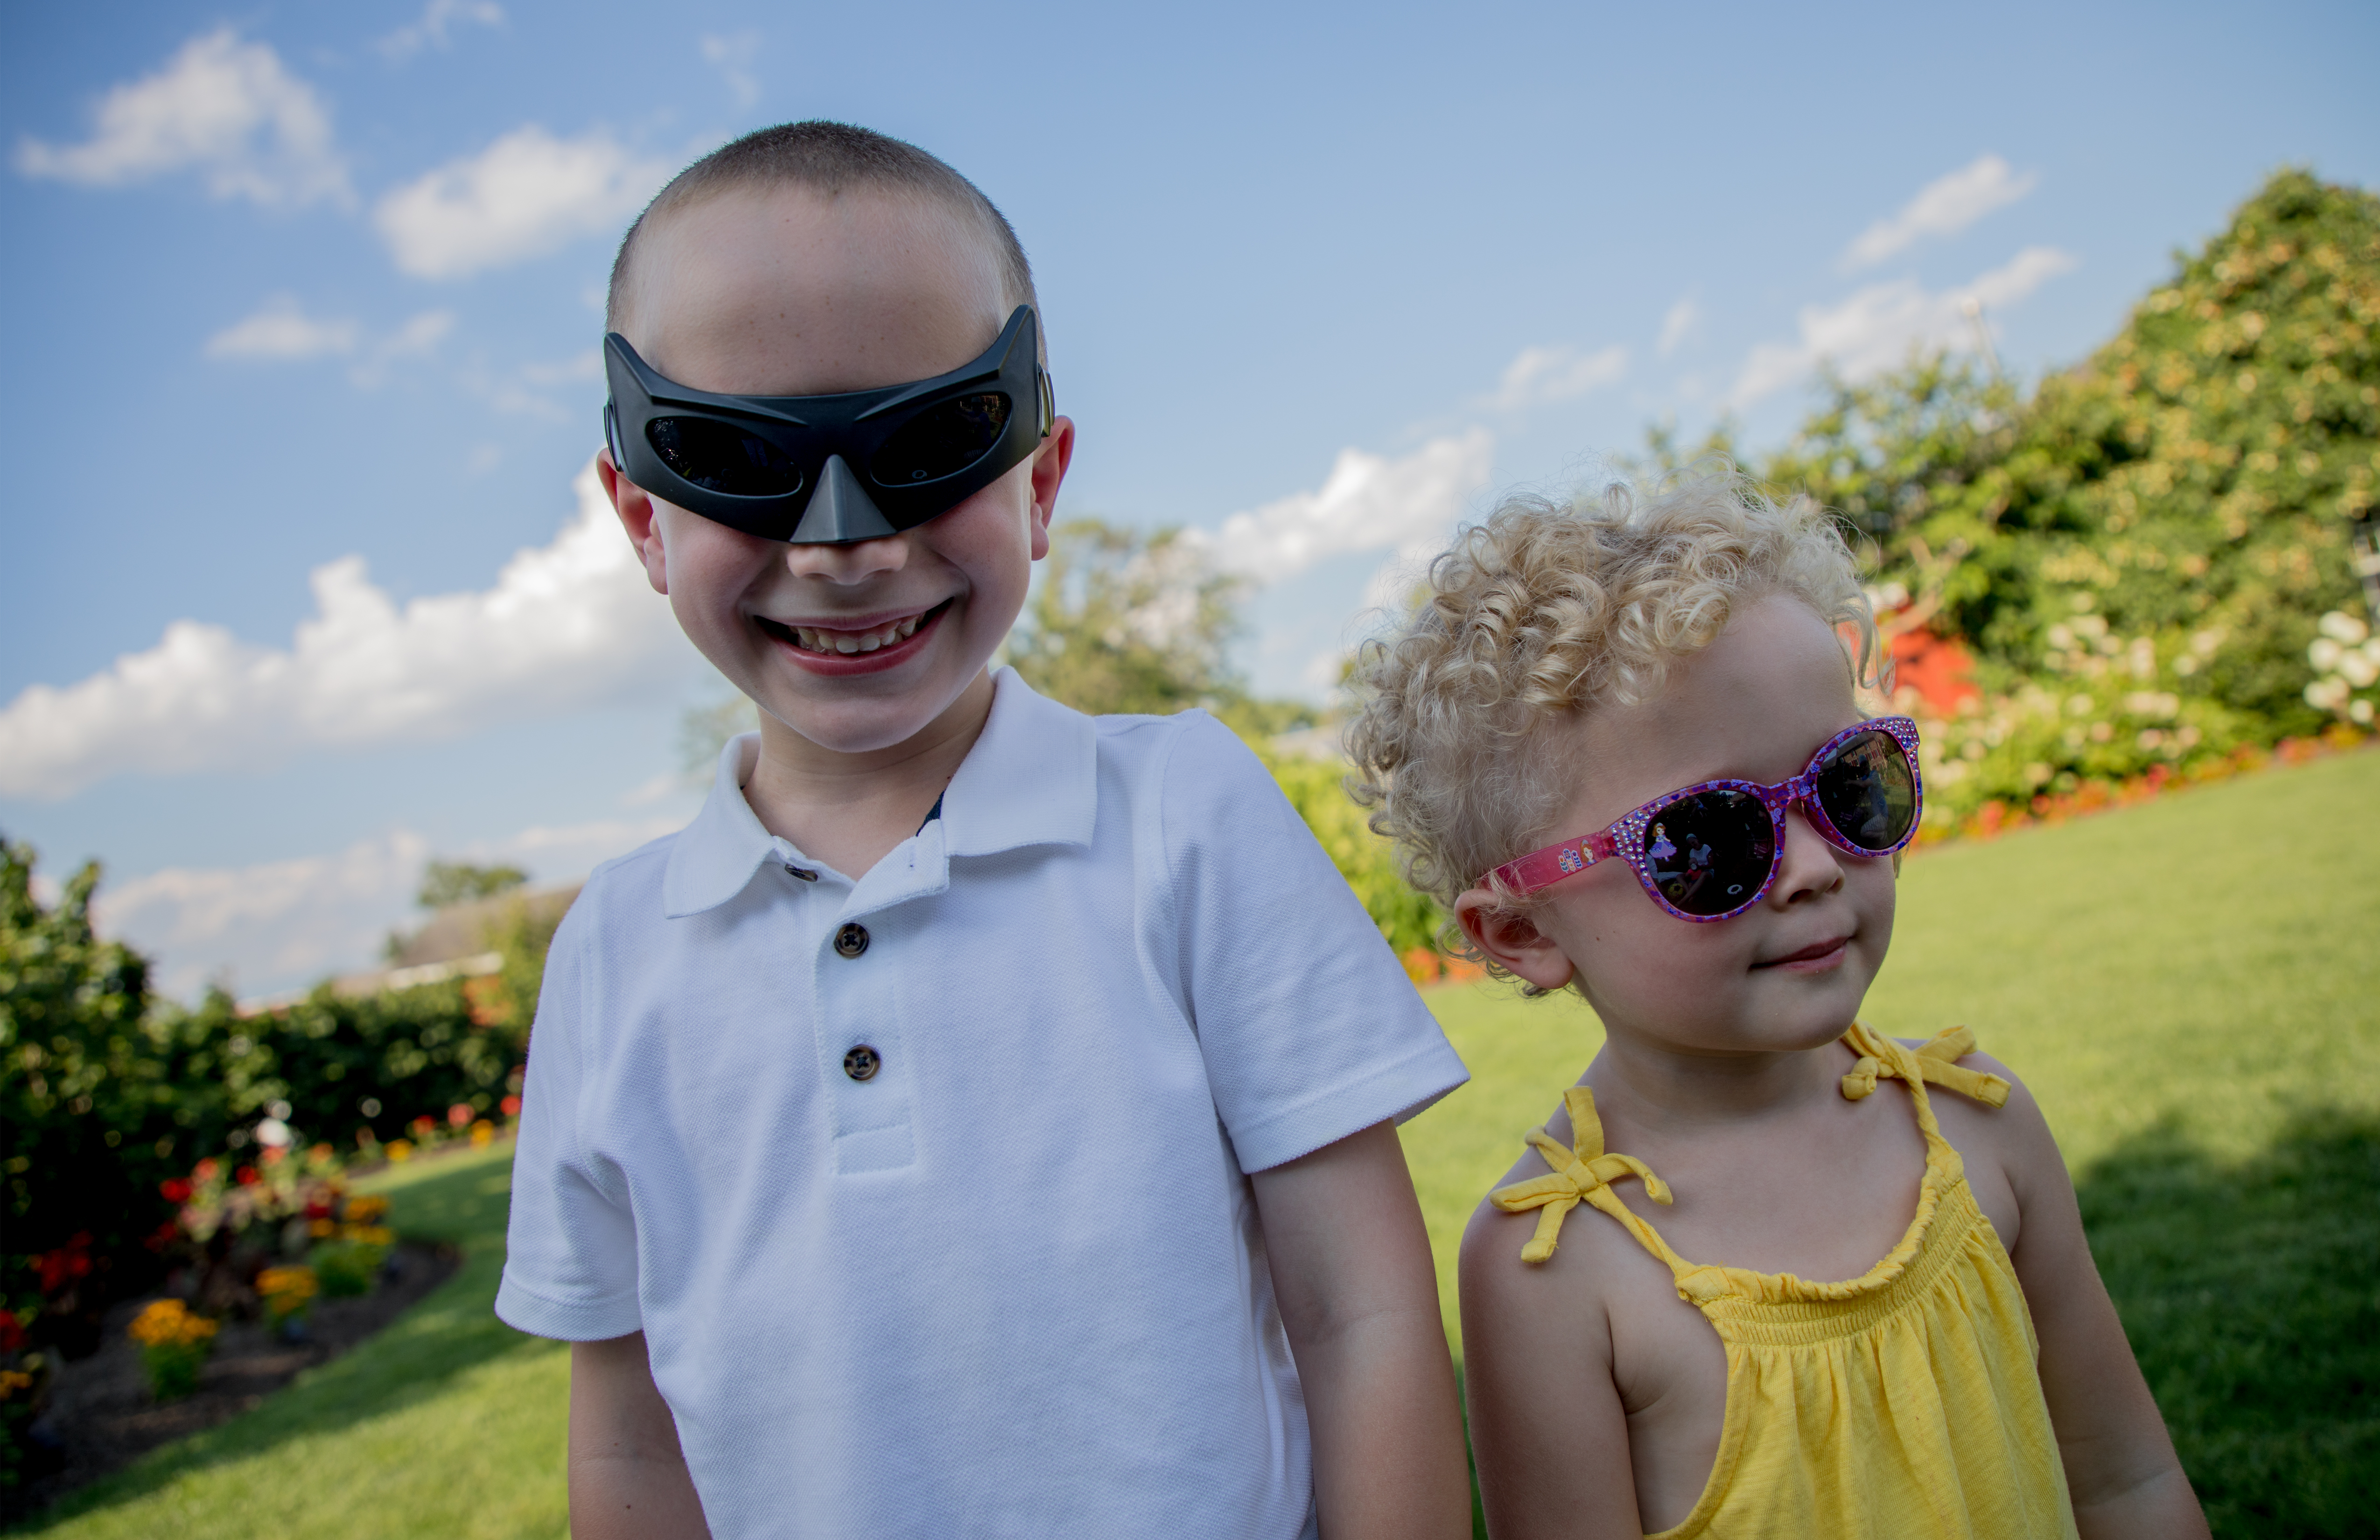 Kids Toddlers Children Siblings